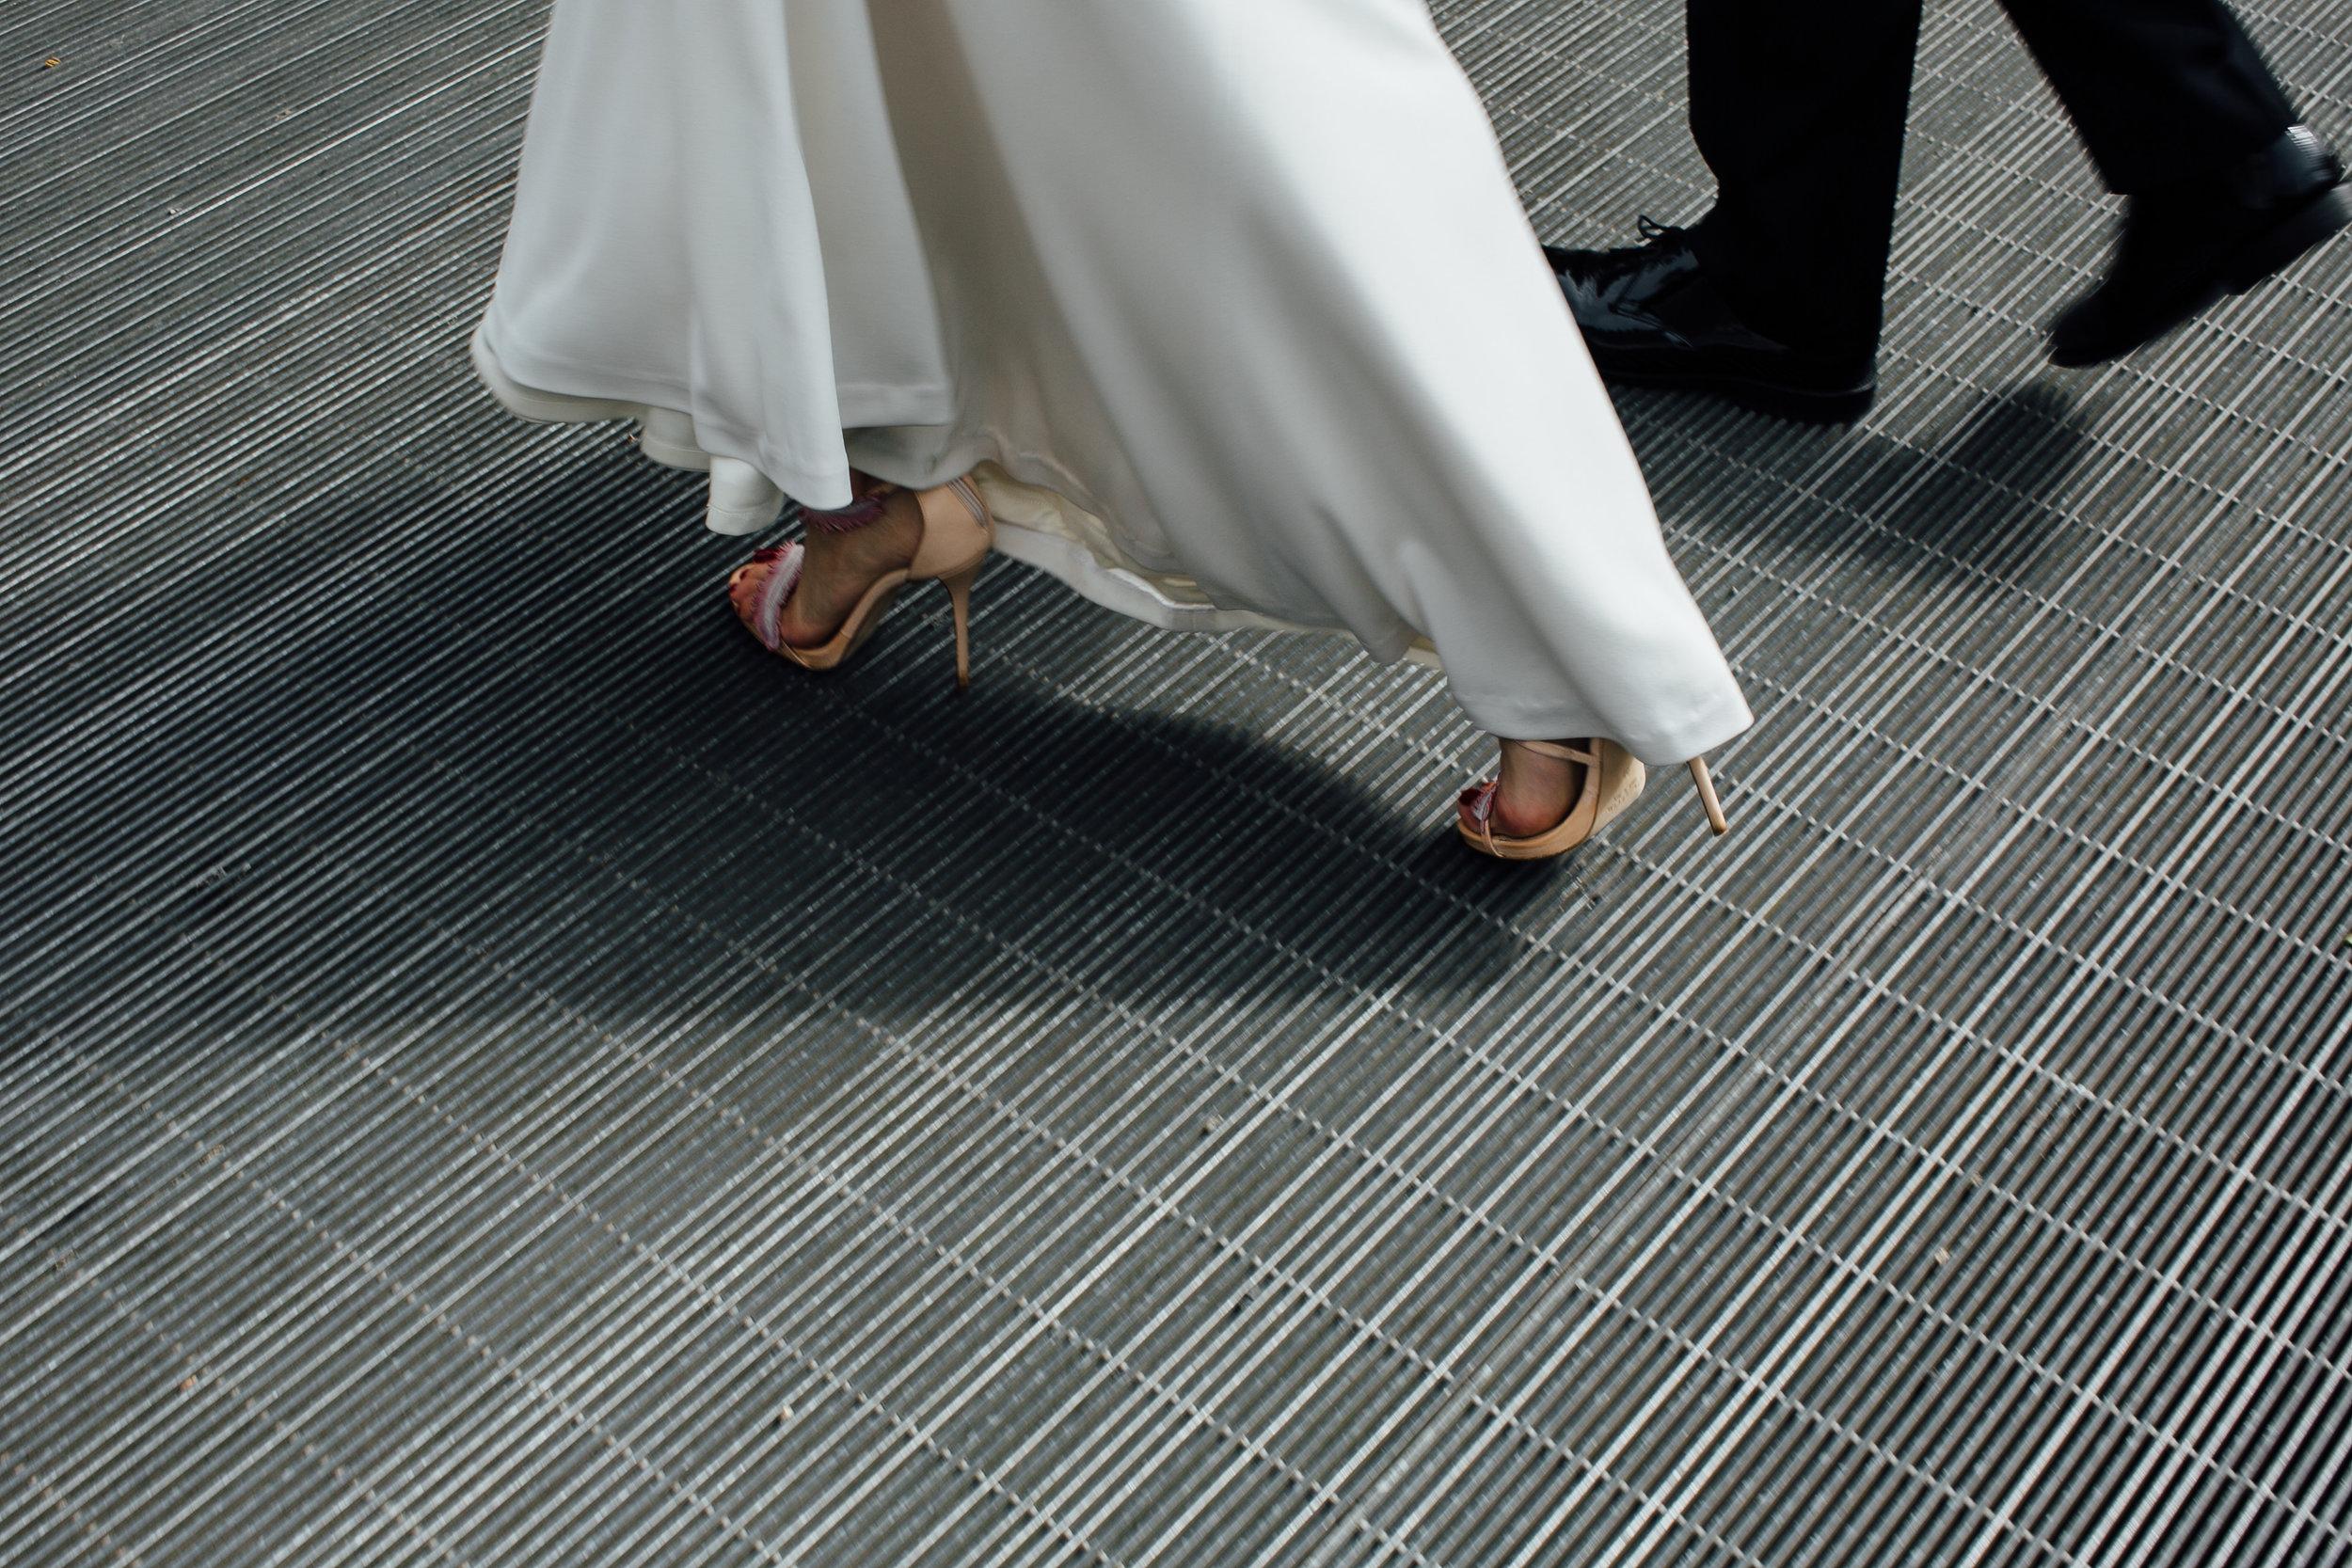 Wedding_KathleenMichael_BG_Portraits-238.jpg